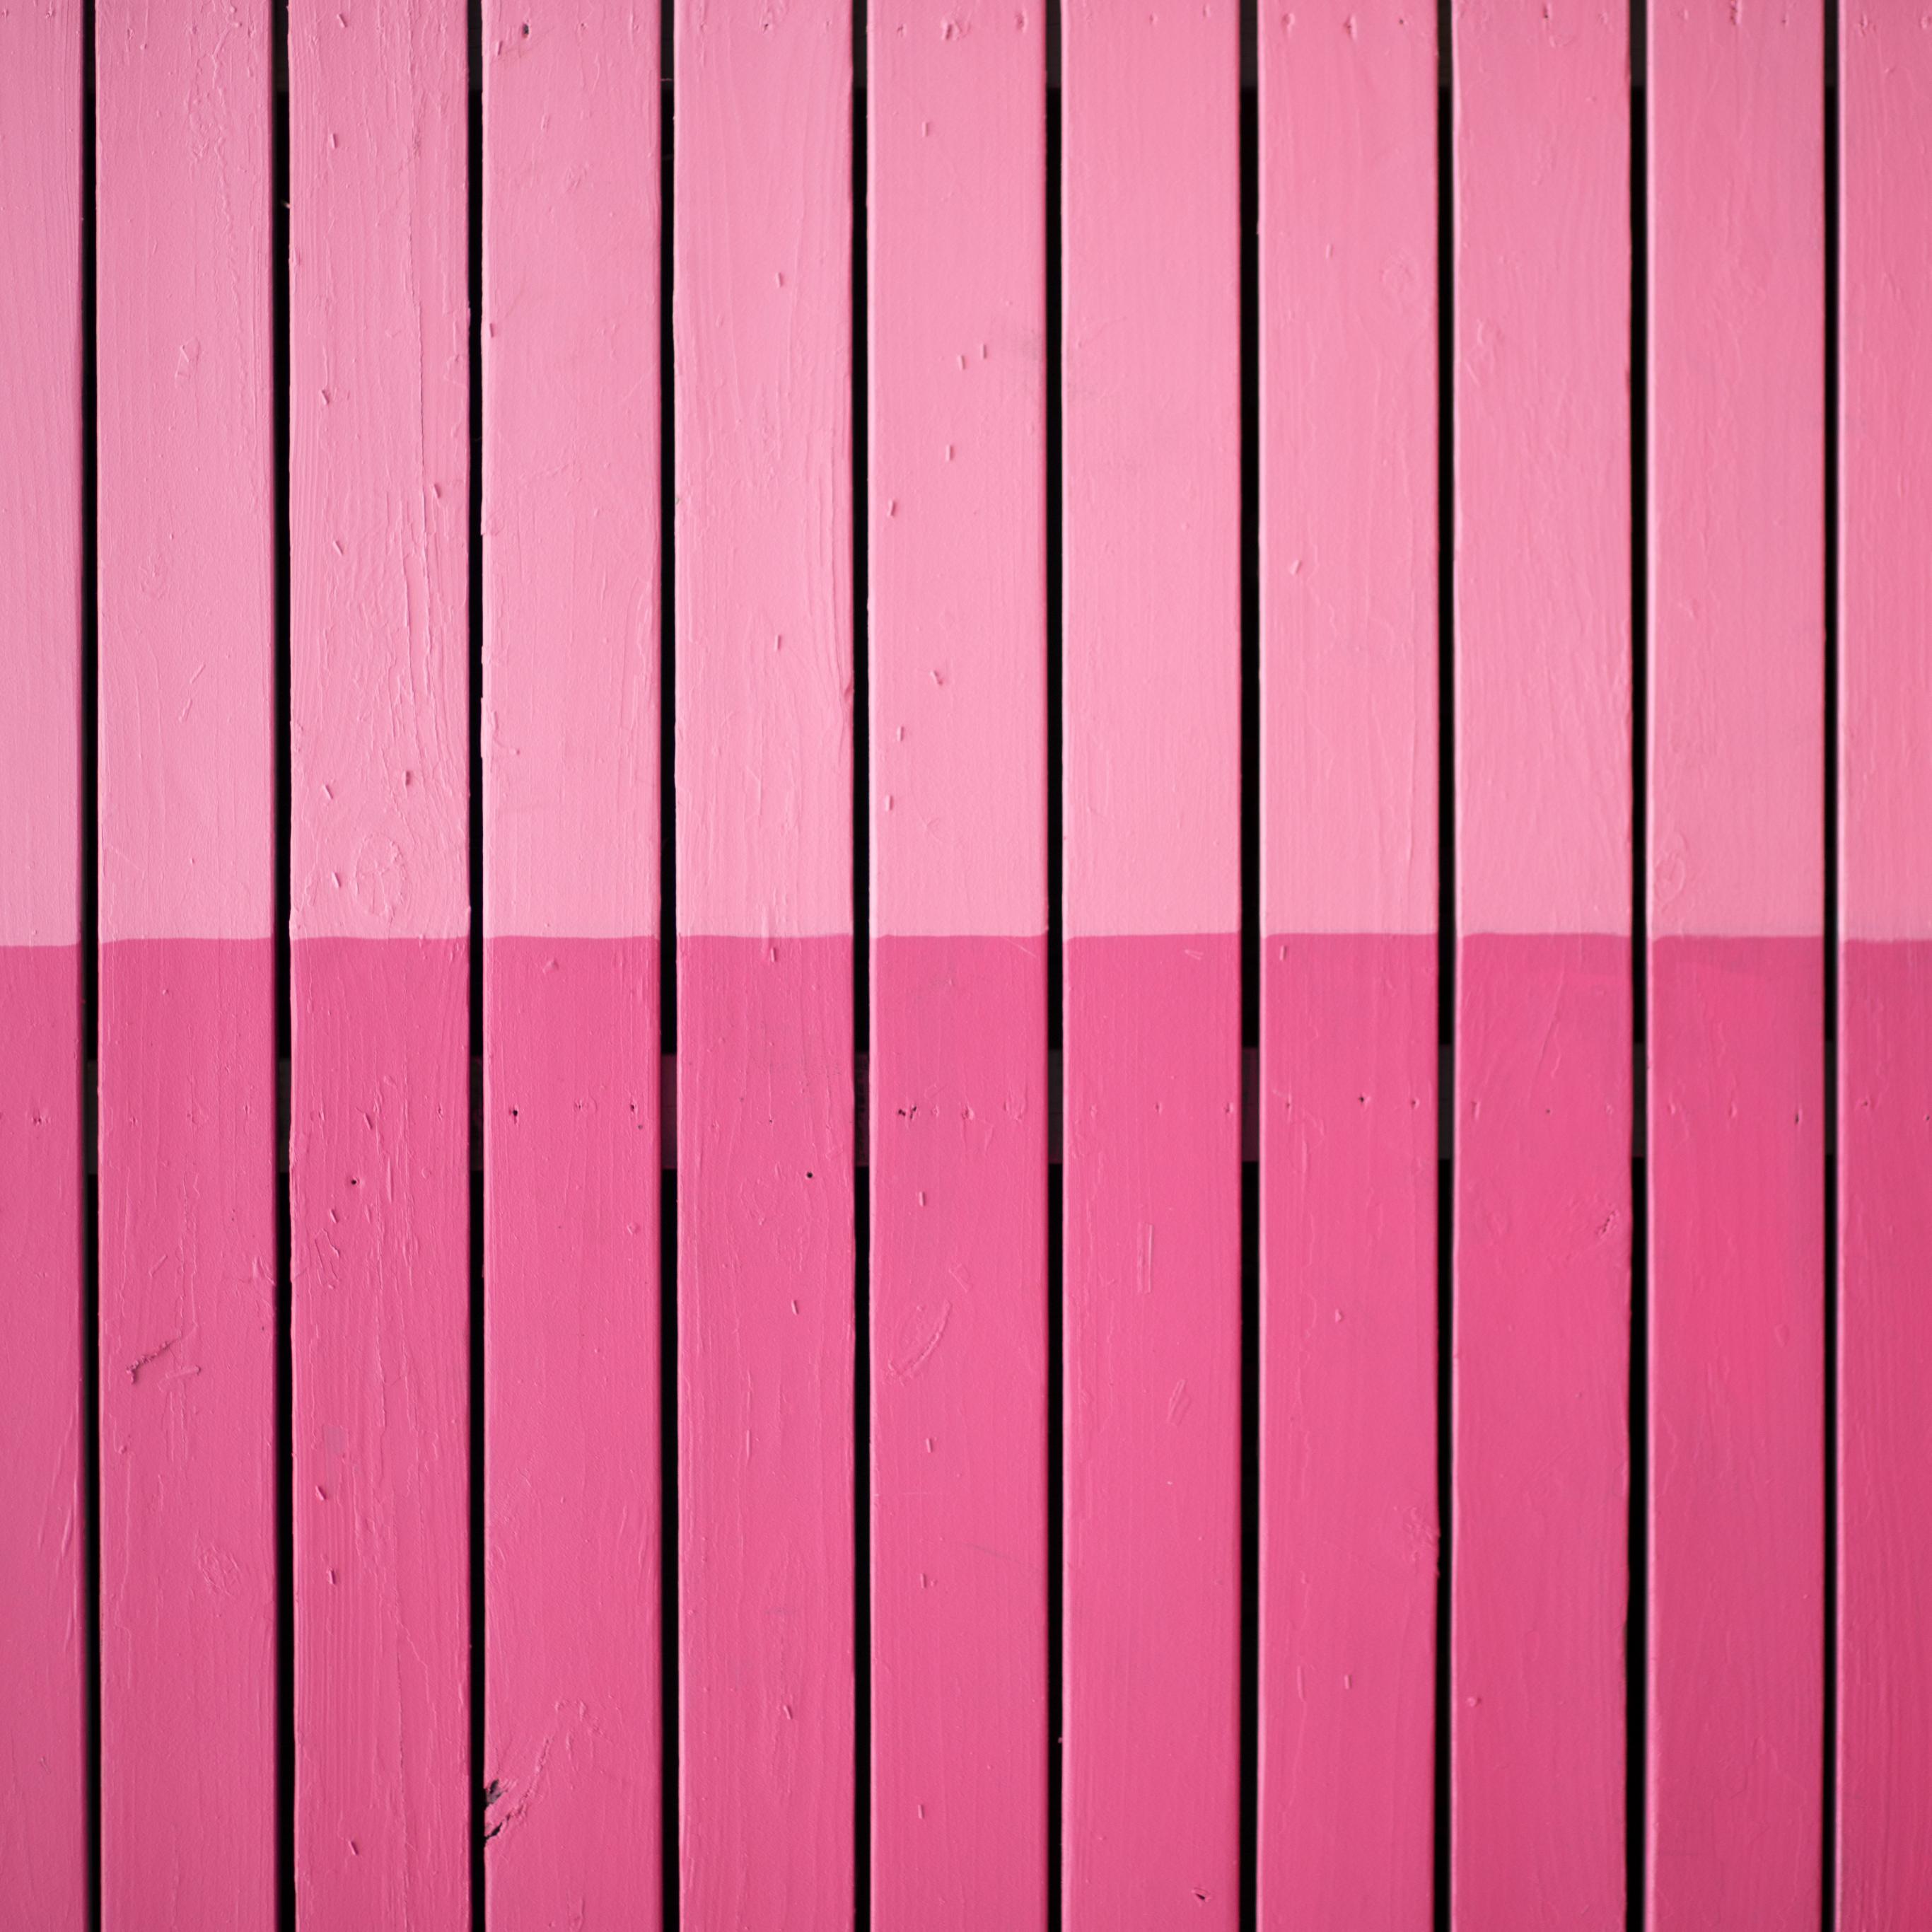 wallpaper weekends: in the pink – pink ipad wallpapers